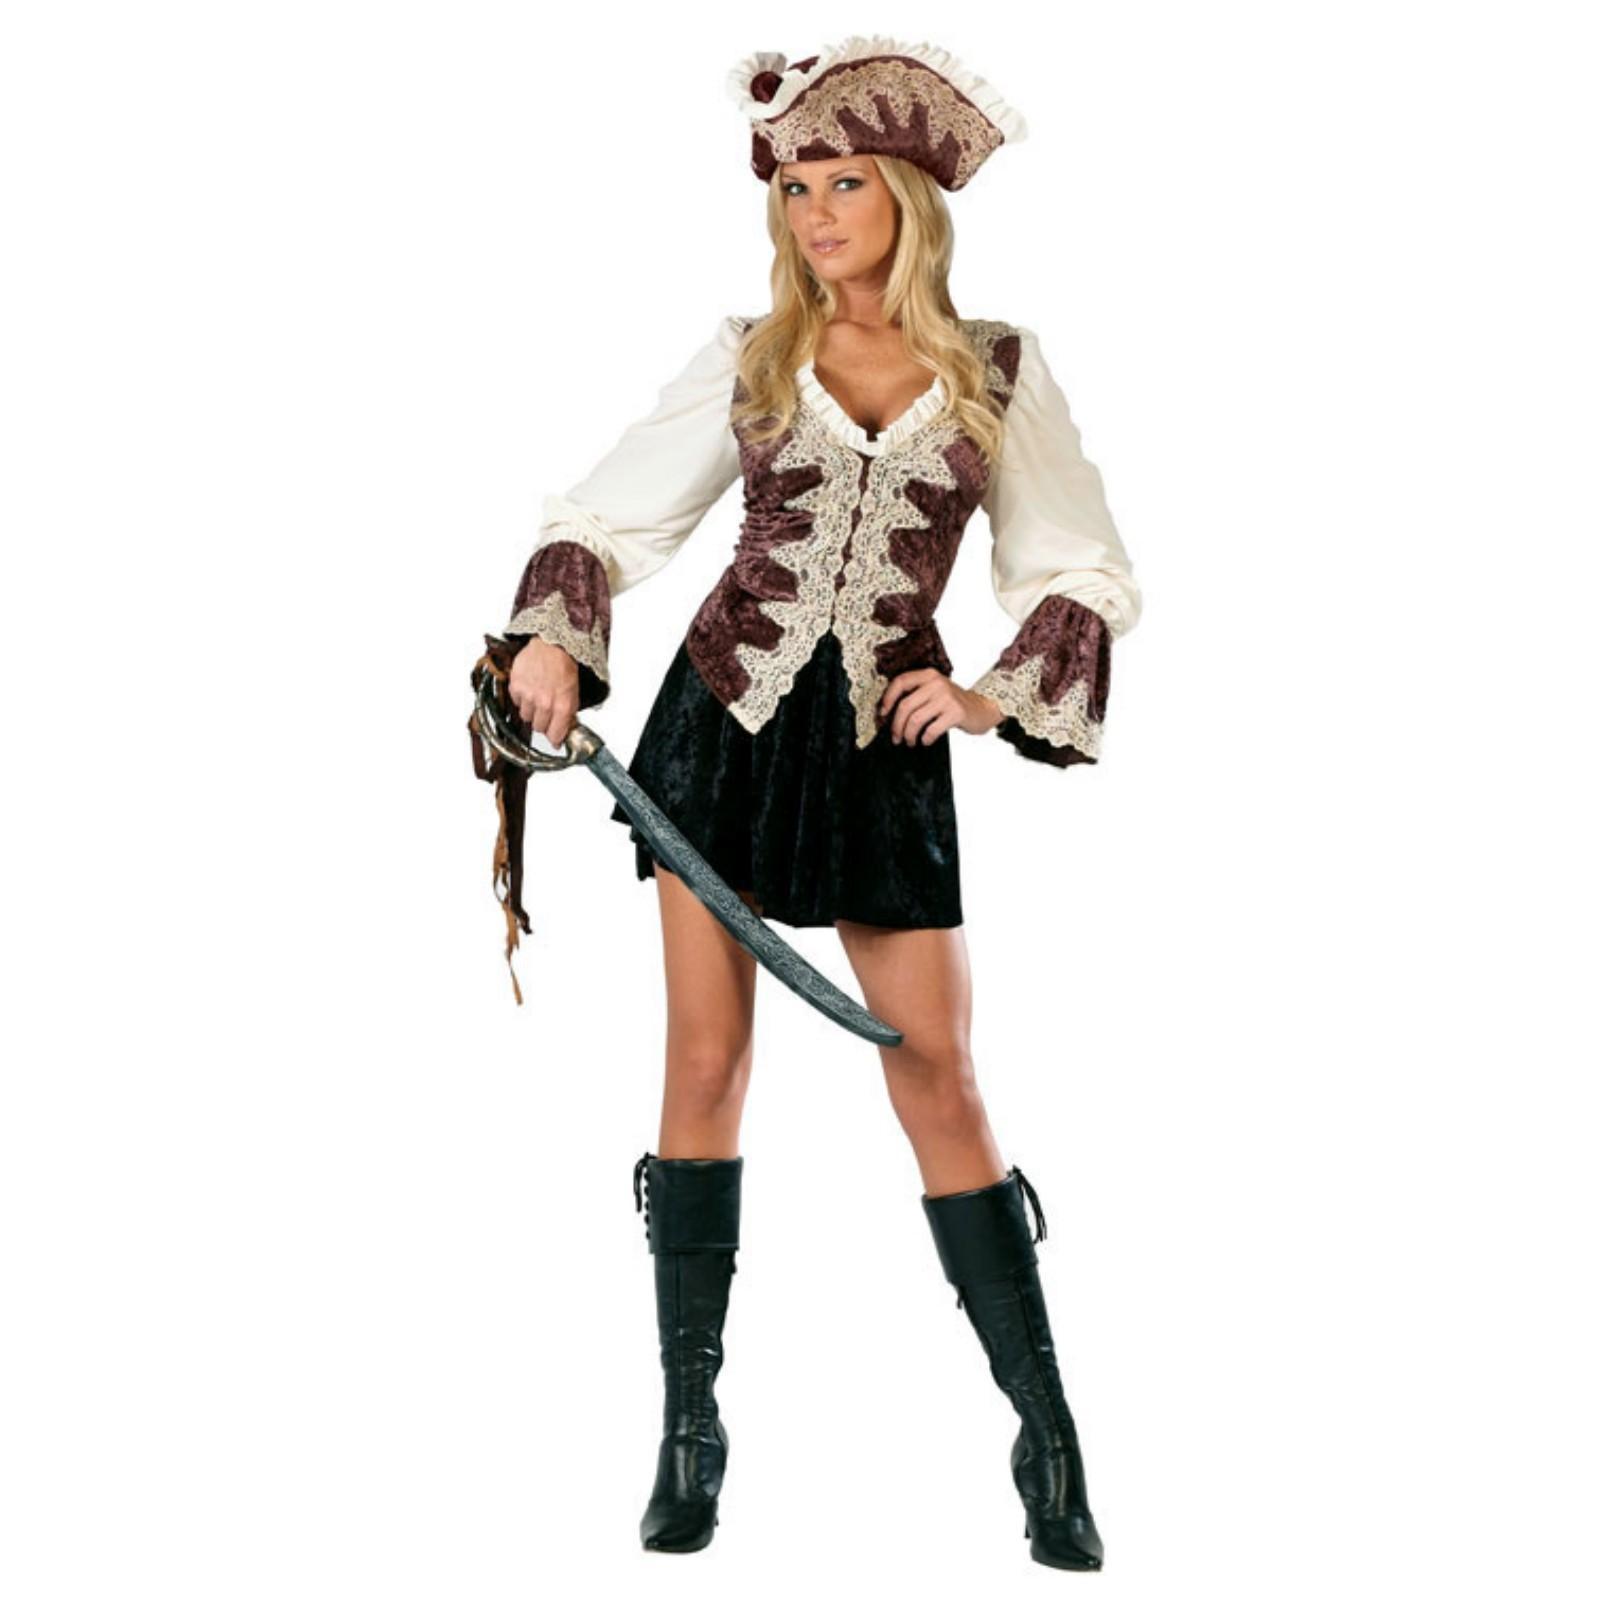 Royal Lady Pirate Adult Costume - M/L (8-14)